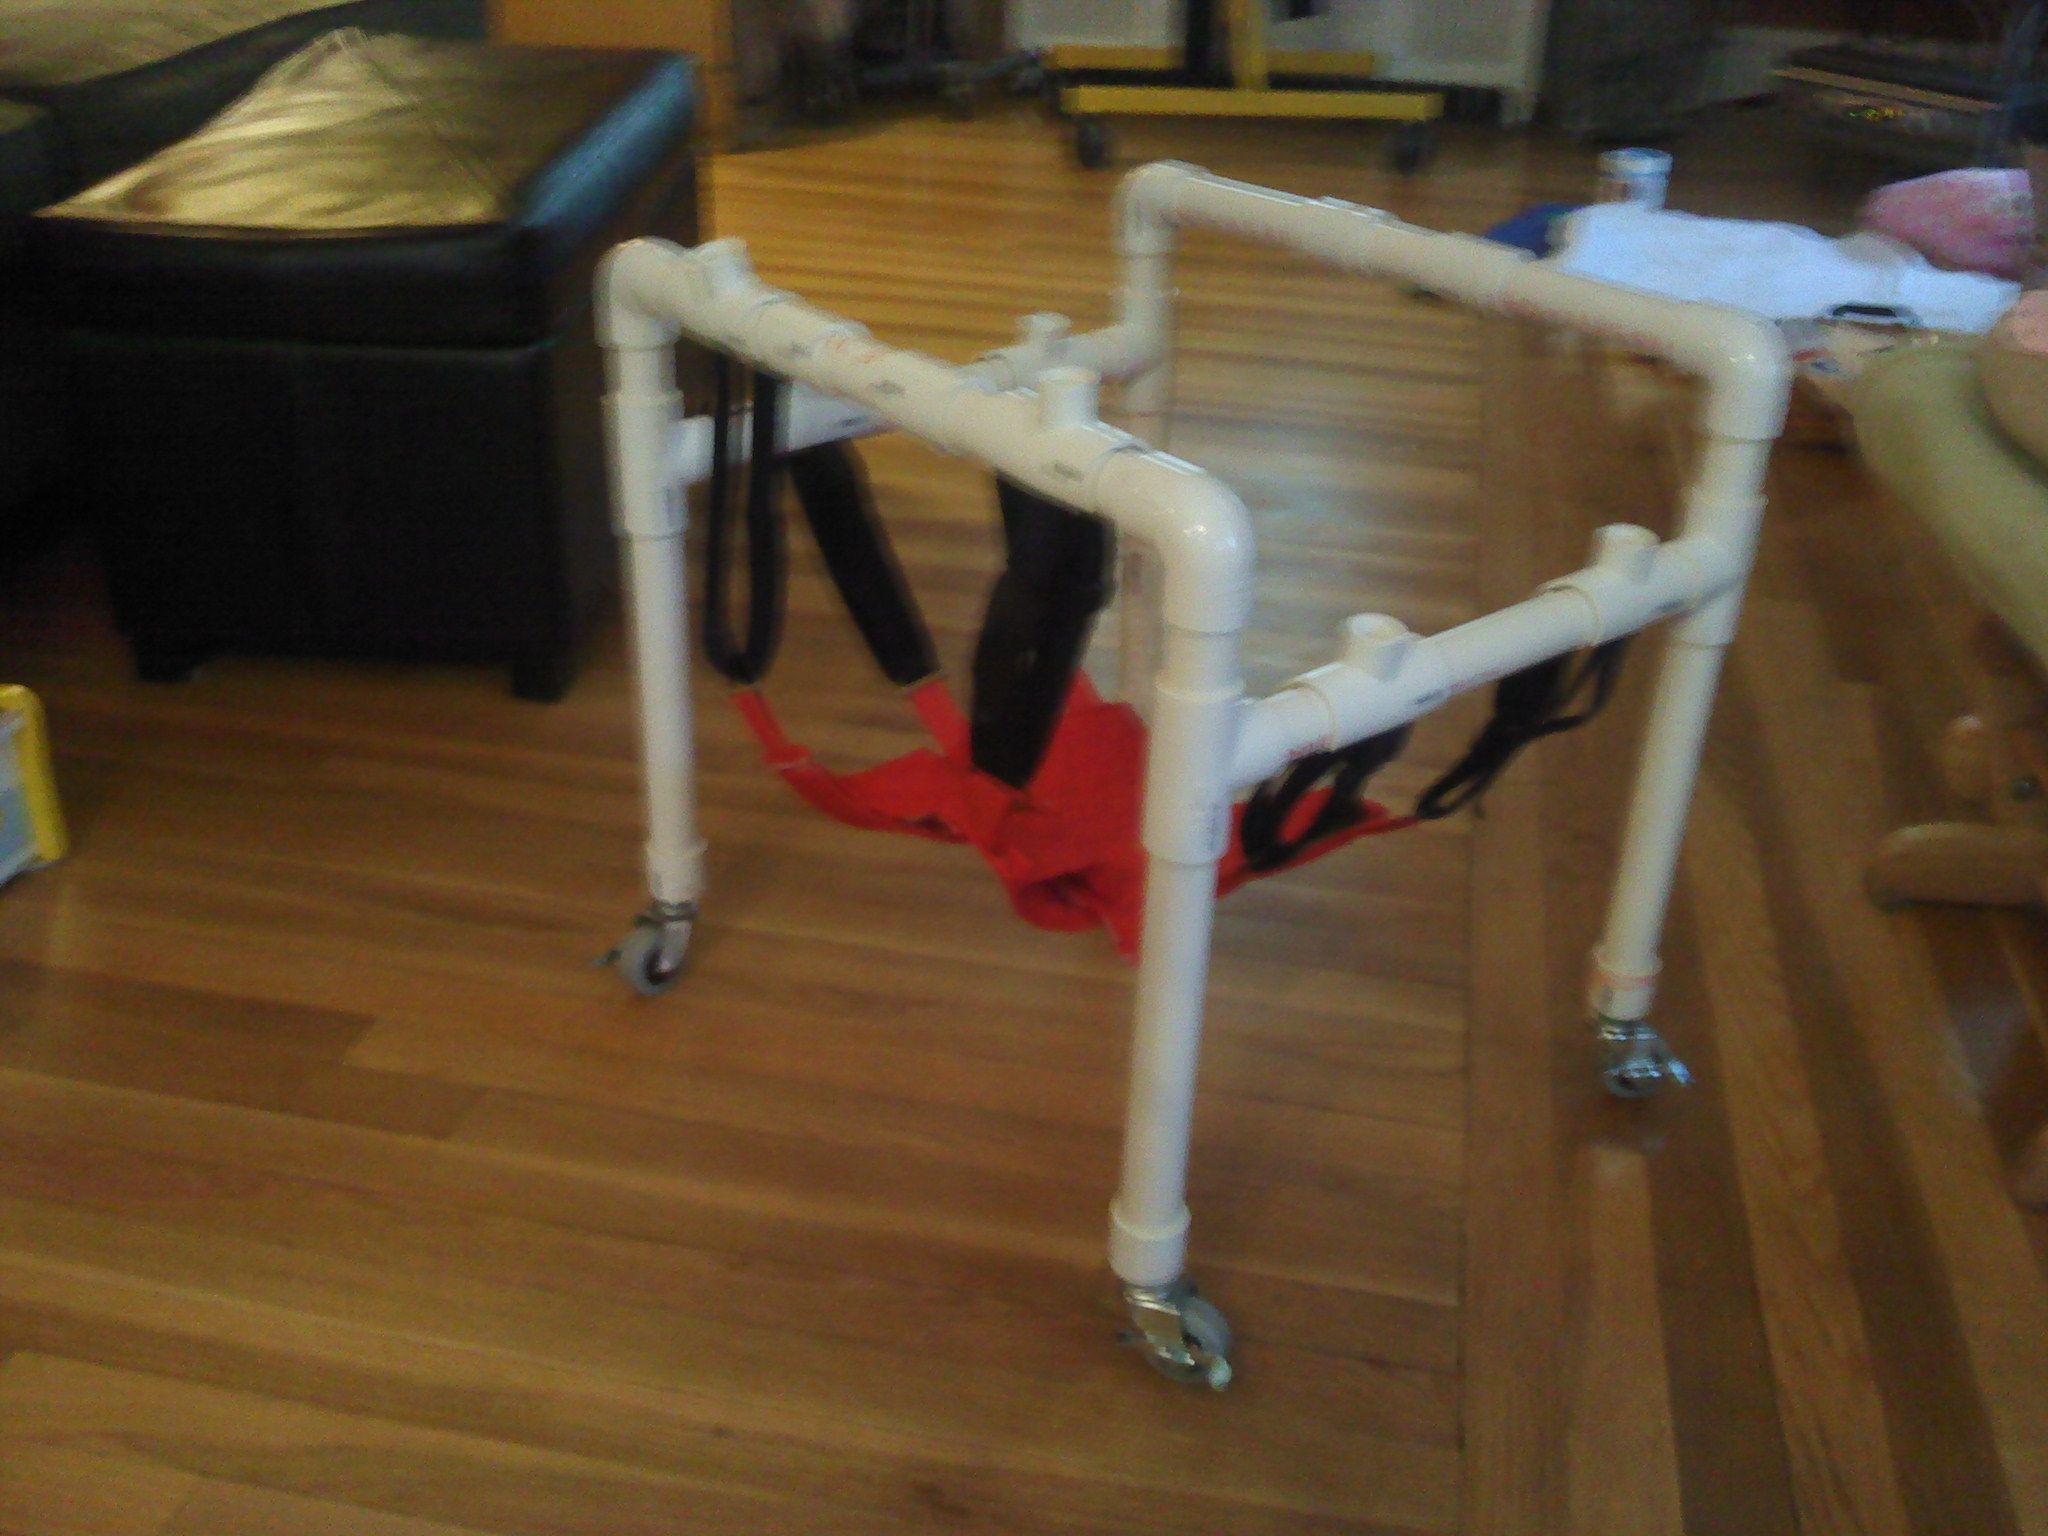 Sophia S Crawler Made With Pvc Tubie Stuff Cp Stuff